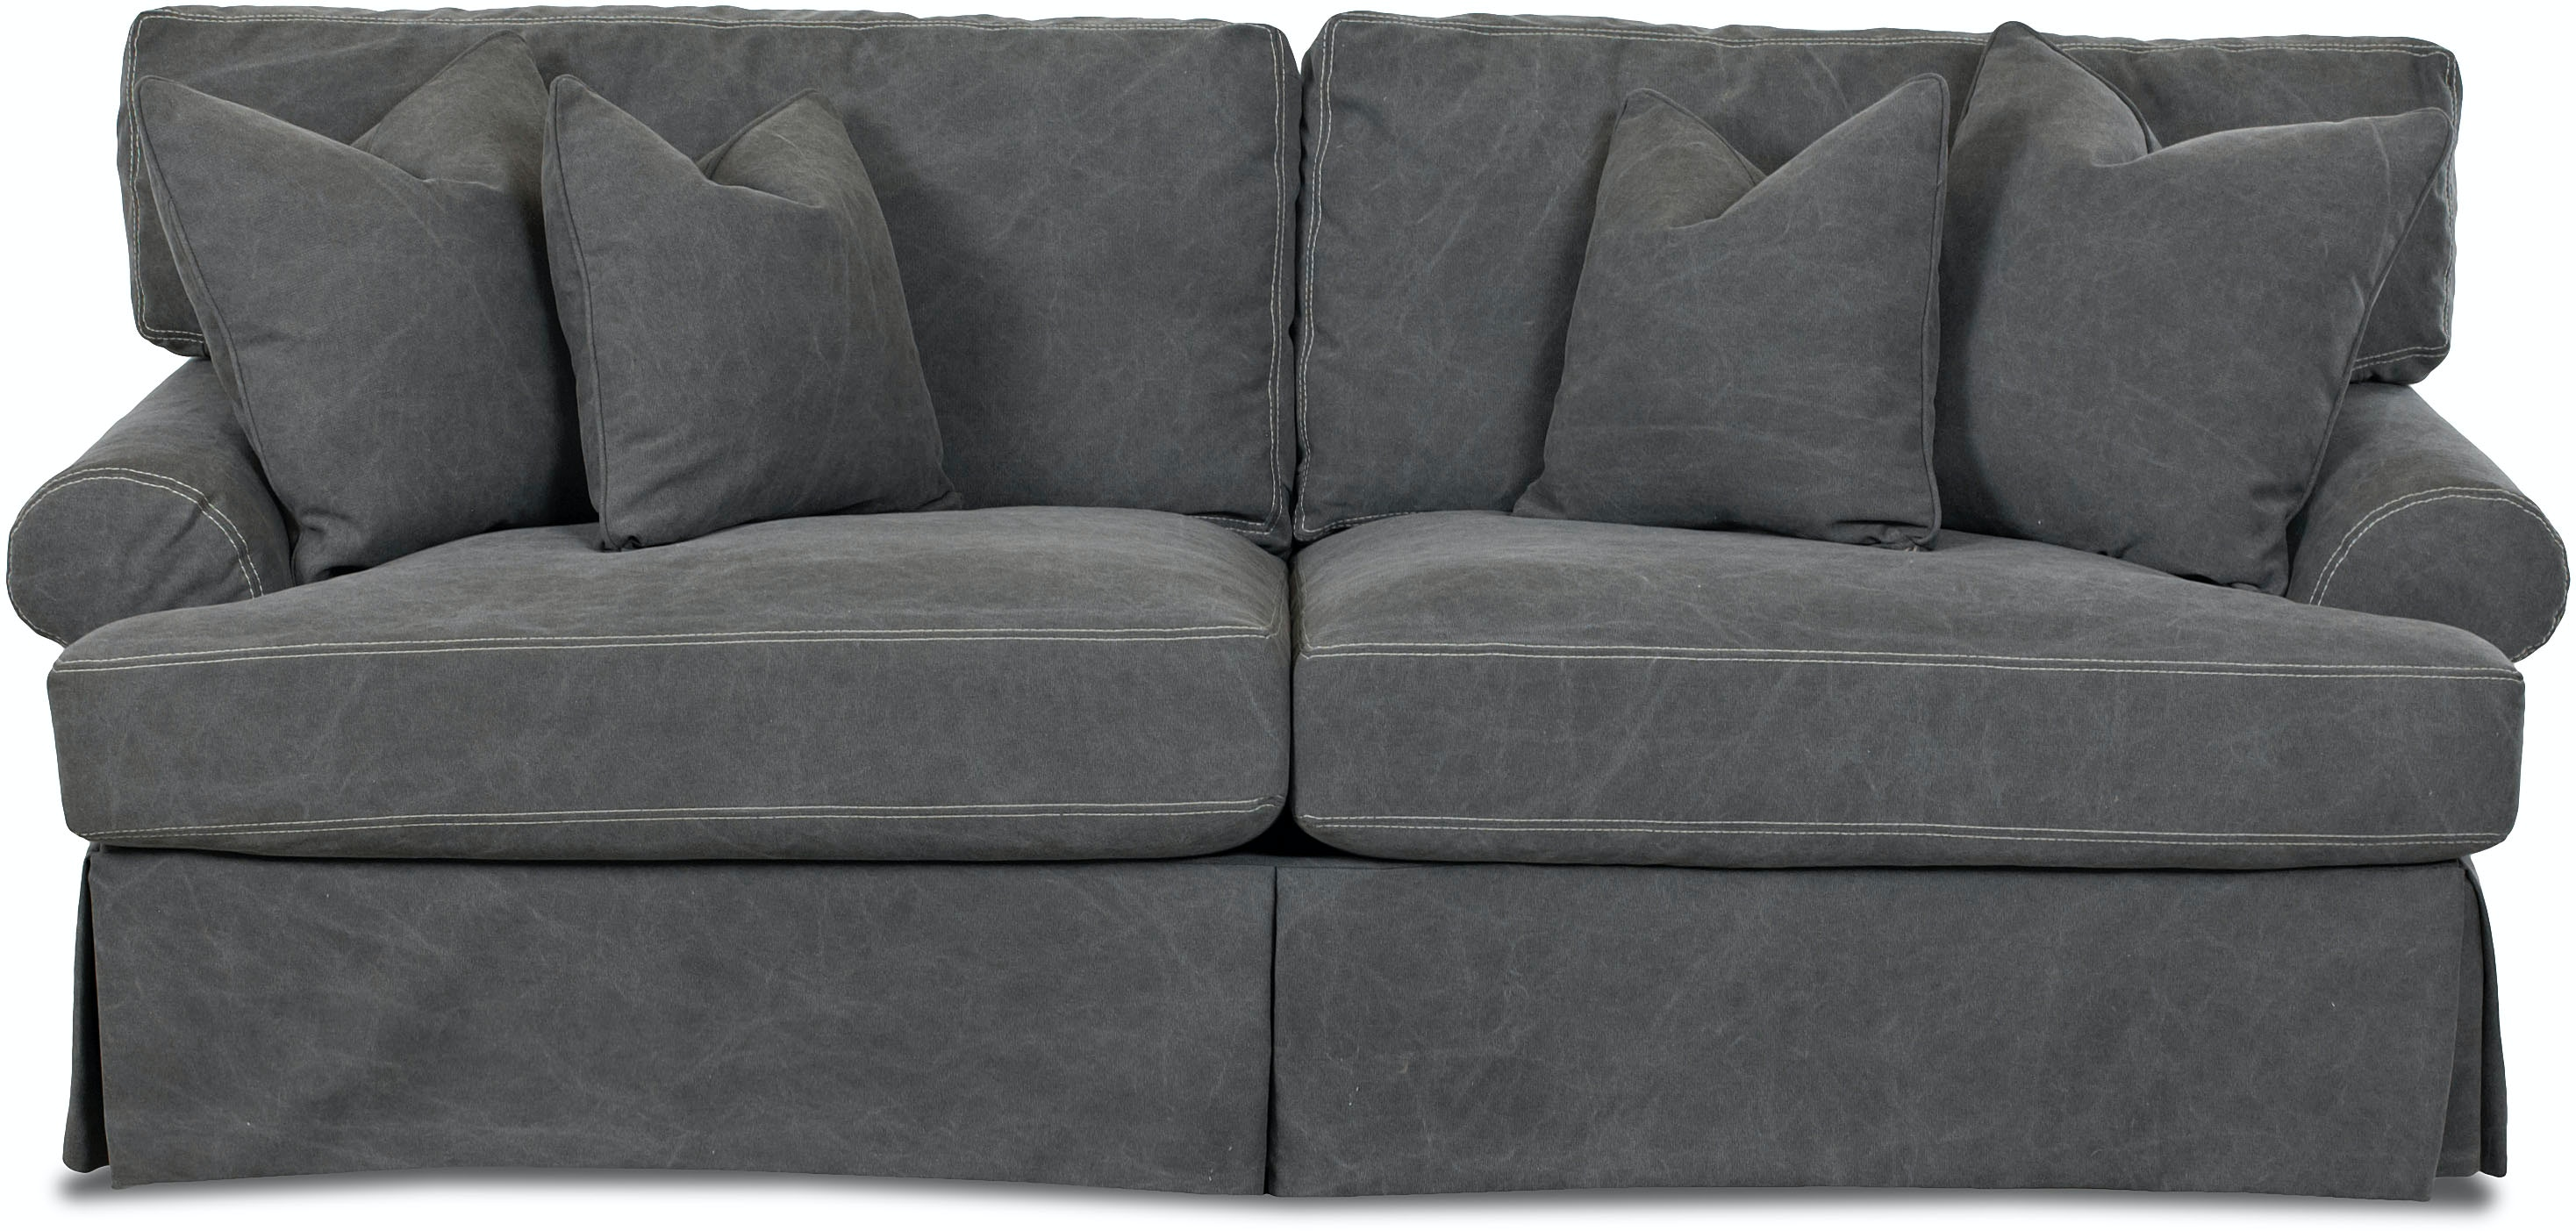 Simple Elegance Lahoya Slipcover Sofa With Pillows 536659 Talsma  ~ White Denim Slipcovers Sofa